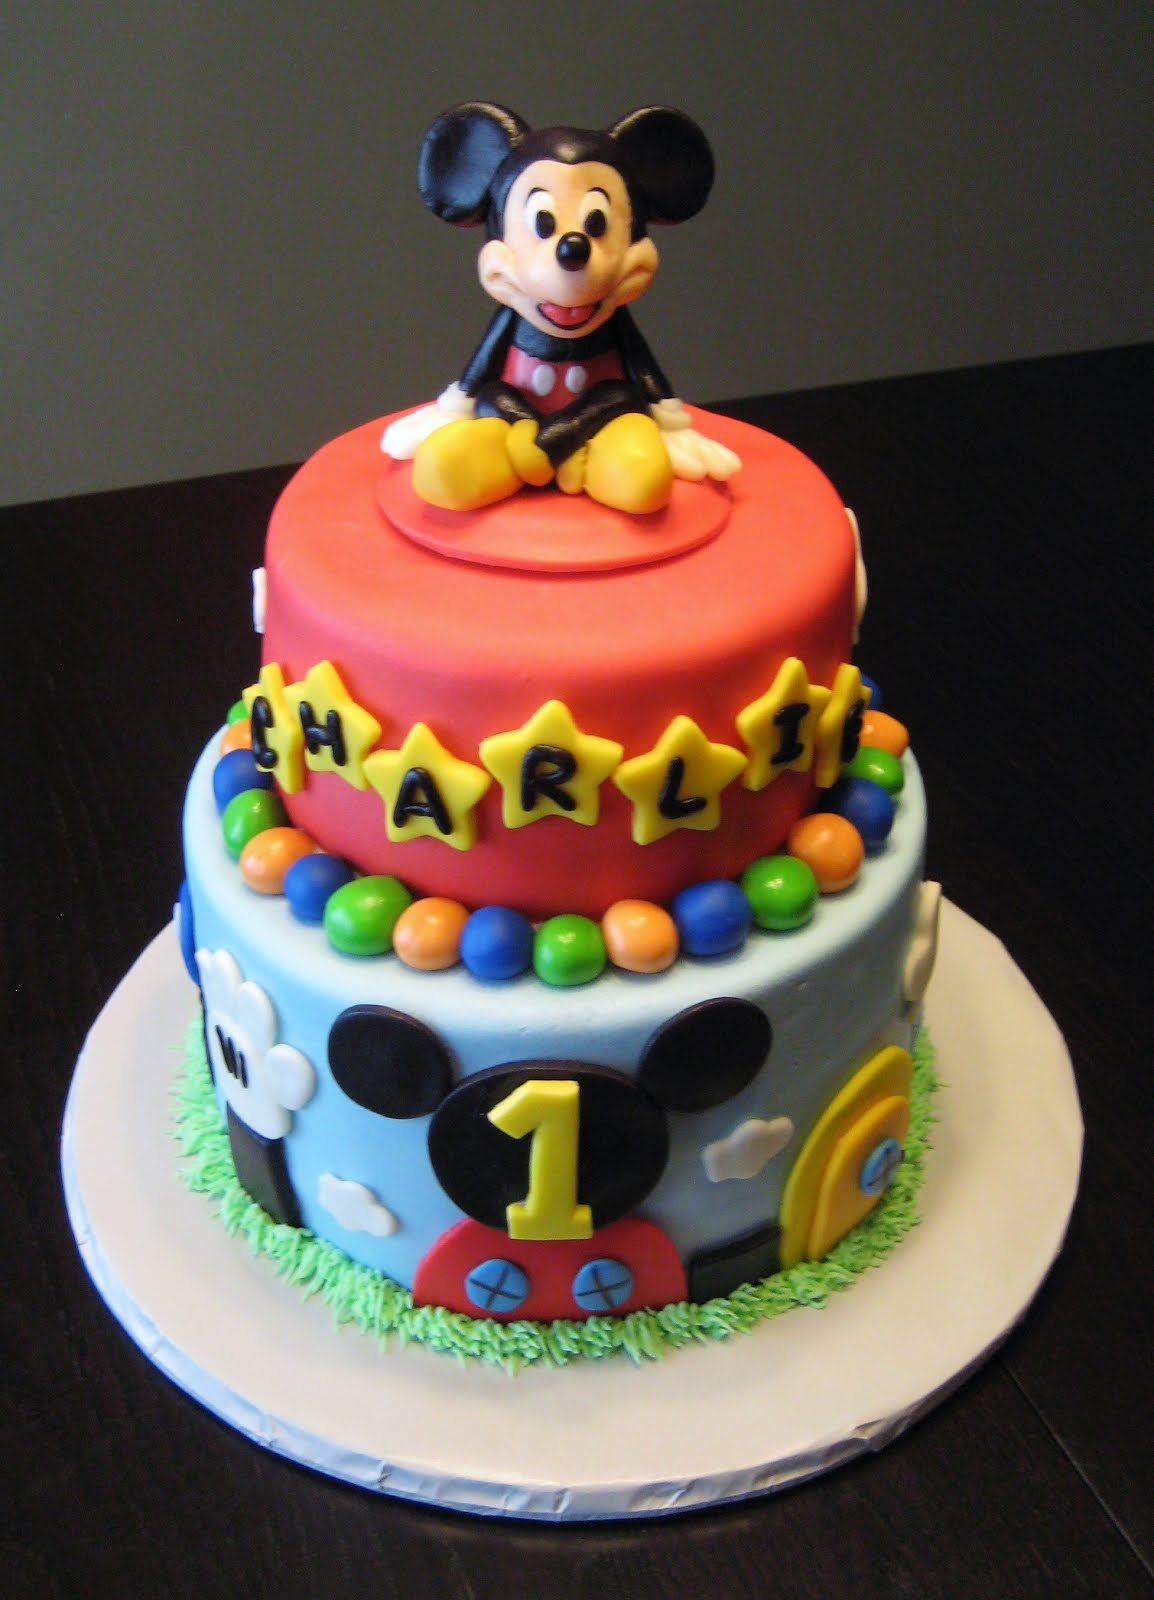 Edible Mickey Mouse Fondant